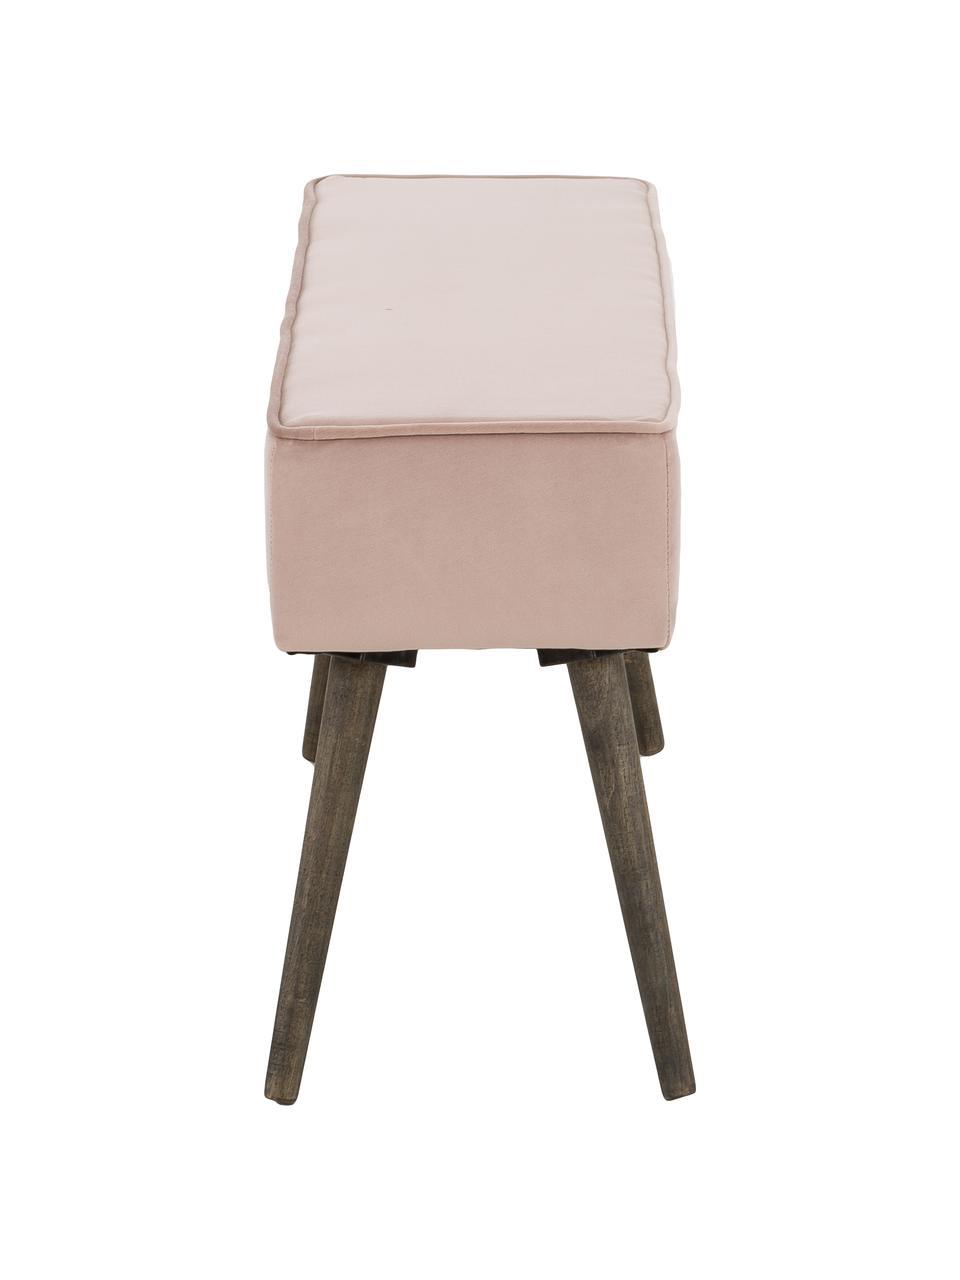 Fluwelen bankje Popy, Bekleding: polyester fluweel, Poten: rubberhout, licht gelakt, Oudroze, 100 x 50 cm